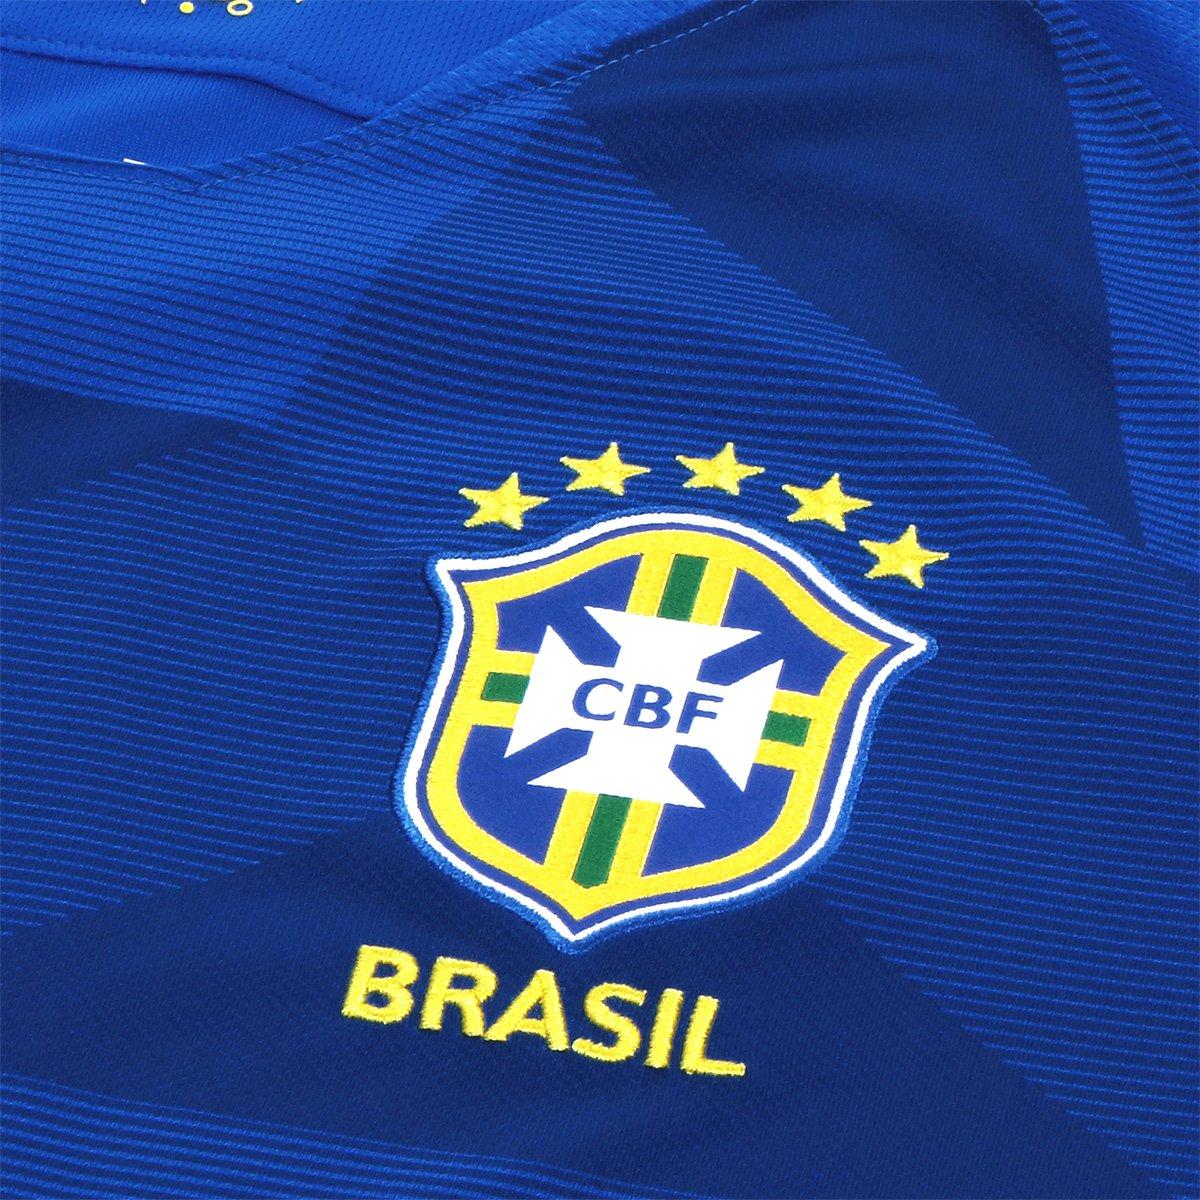 ee19775011 ... Camisa Seleção Brasil II 2018 nº 9 G. Jesus - Torcedor Nike Masculina  ...